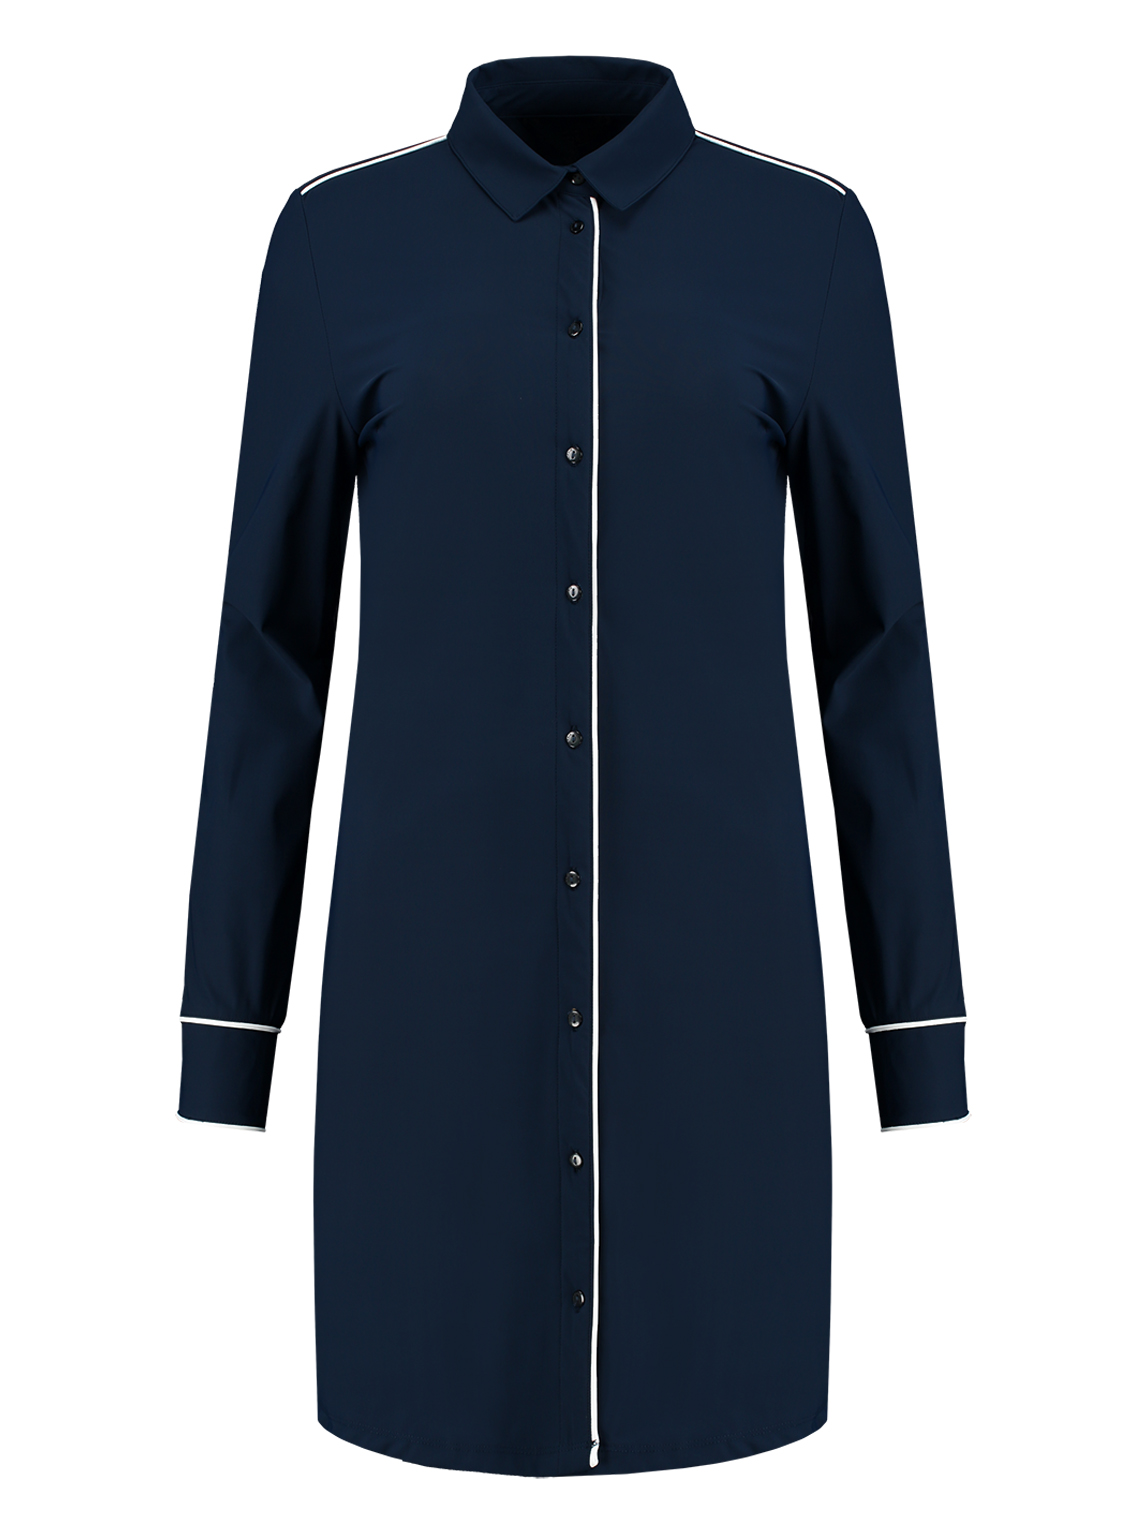 Donkerblauwe blouse jurk Nikkie - Suzy Blouse Dress - N5-362 1904 7800